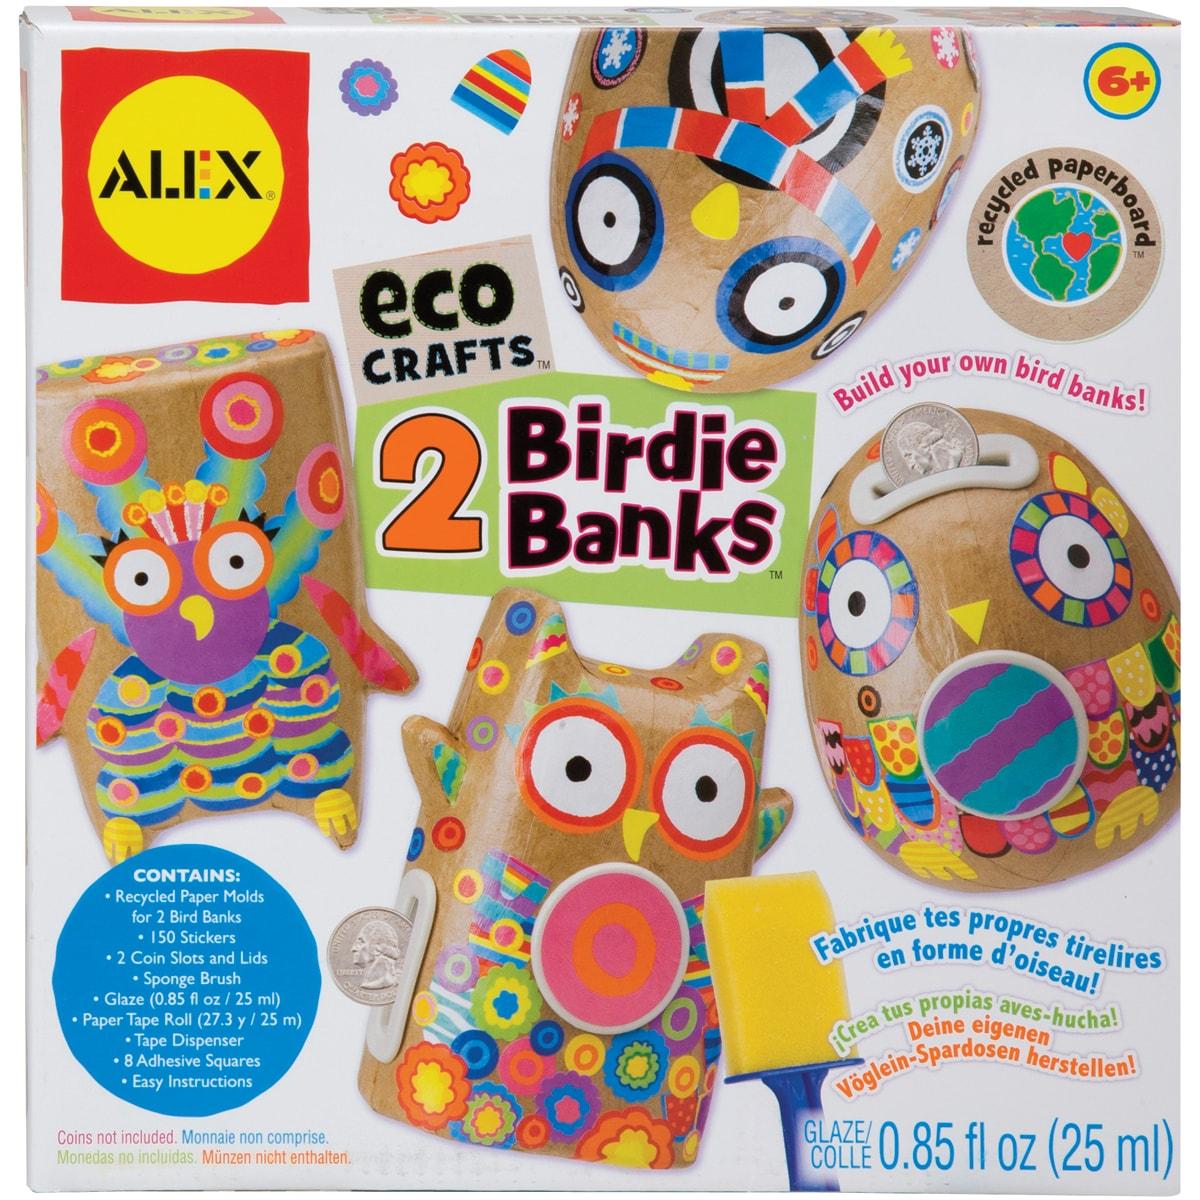 2 Birdie Banks Kit